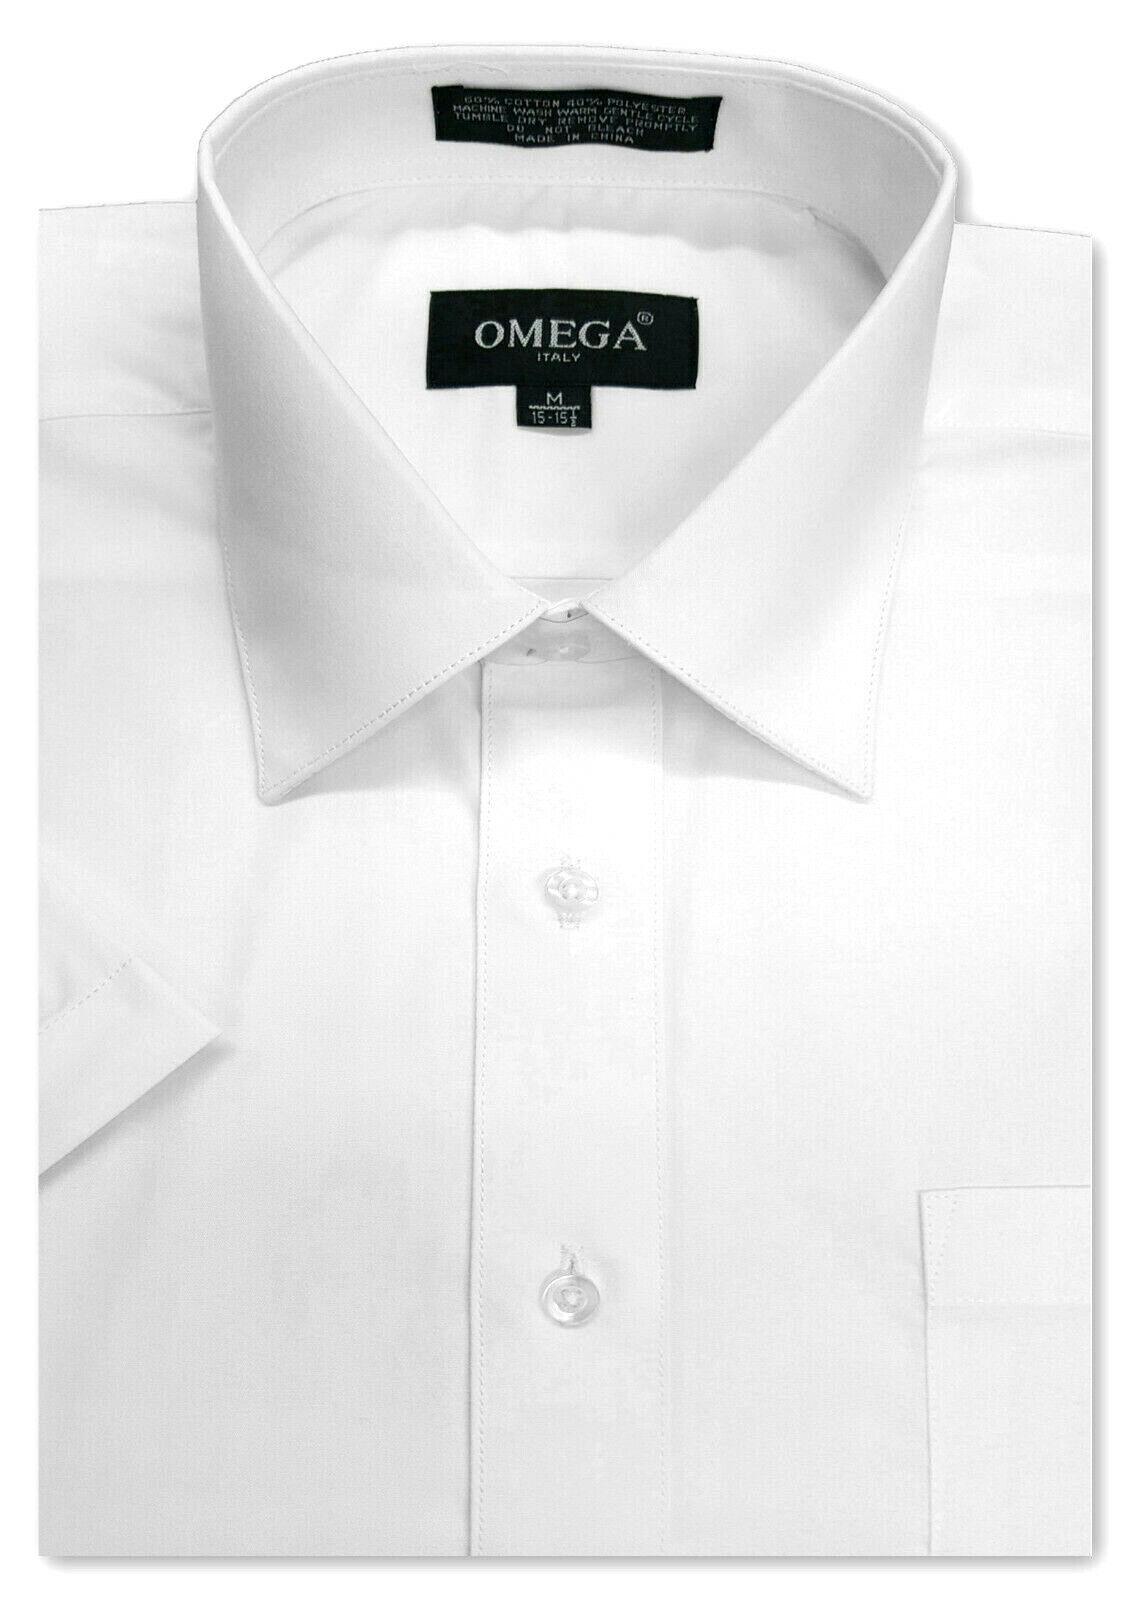 Men/'s Premium Dress Shirts